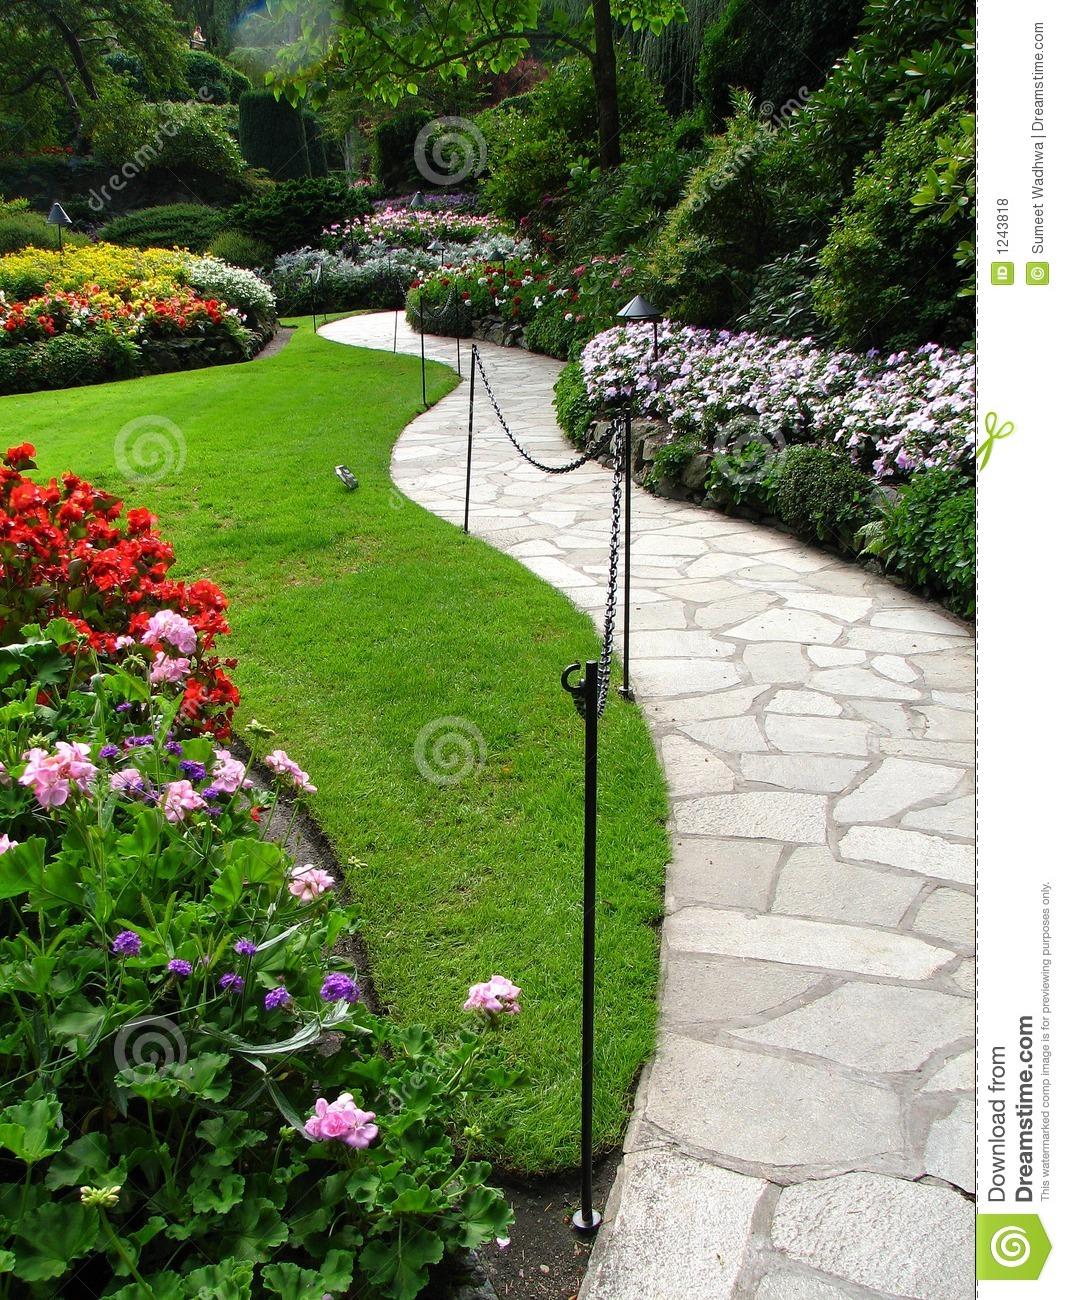 Palavraschave jardins; plantas;flores;passeio; decoração externa